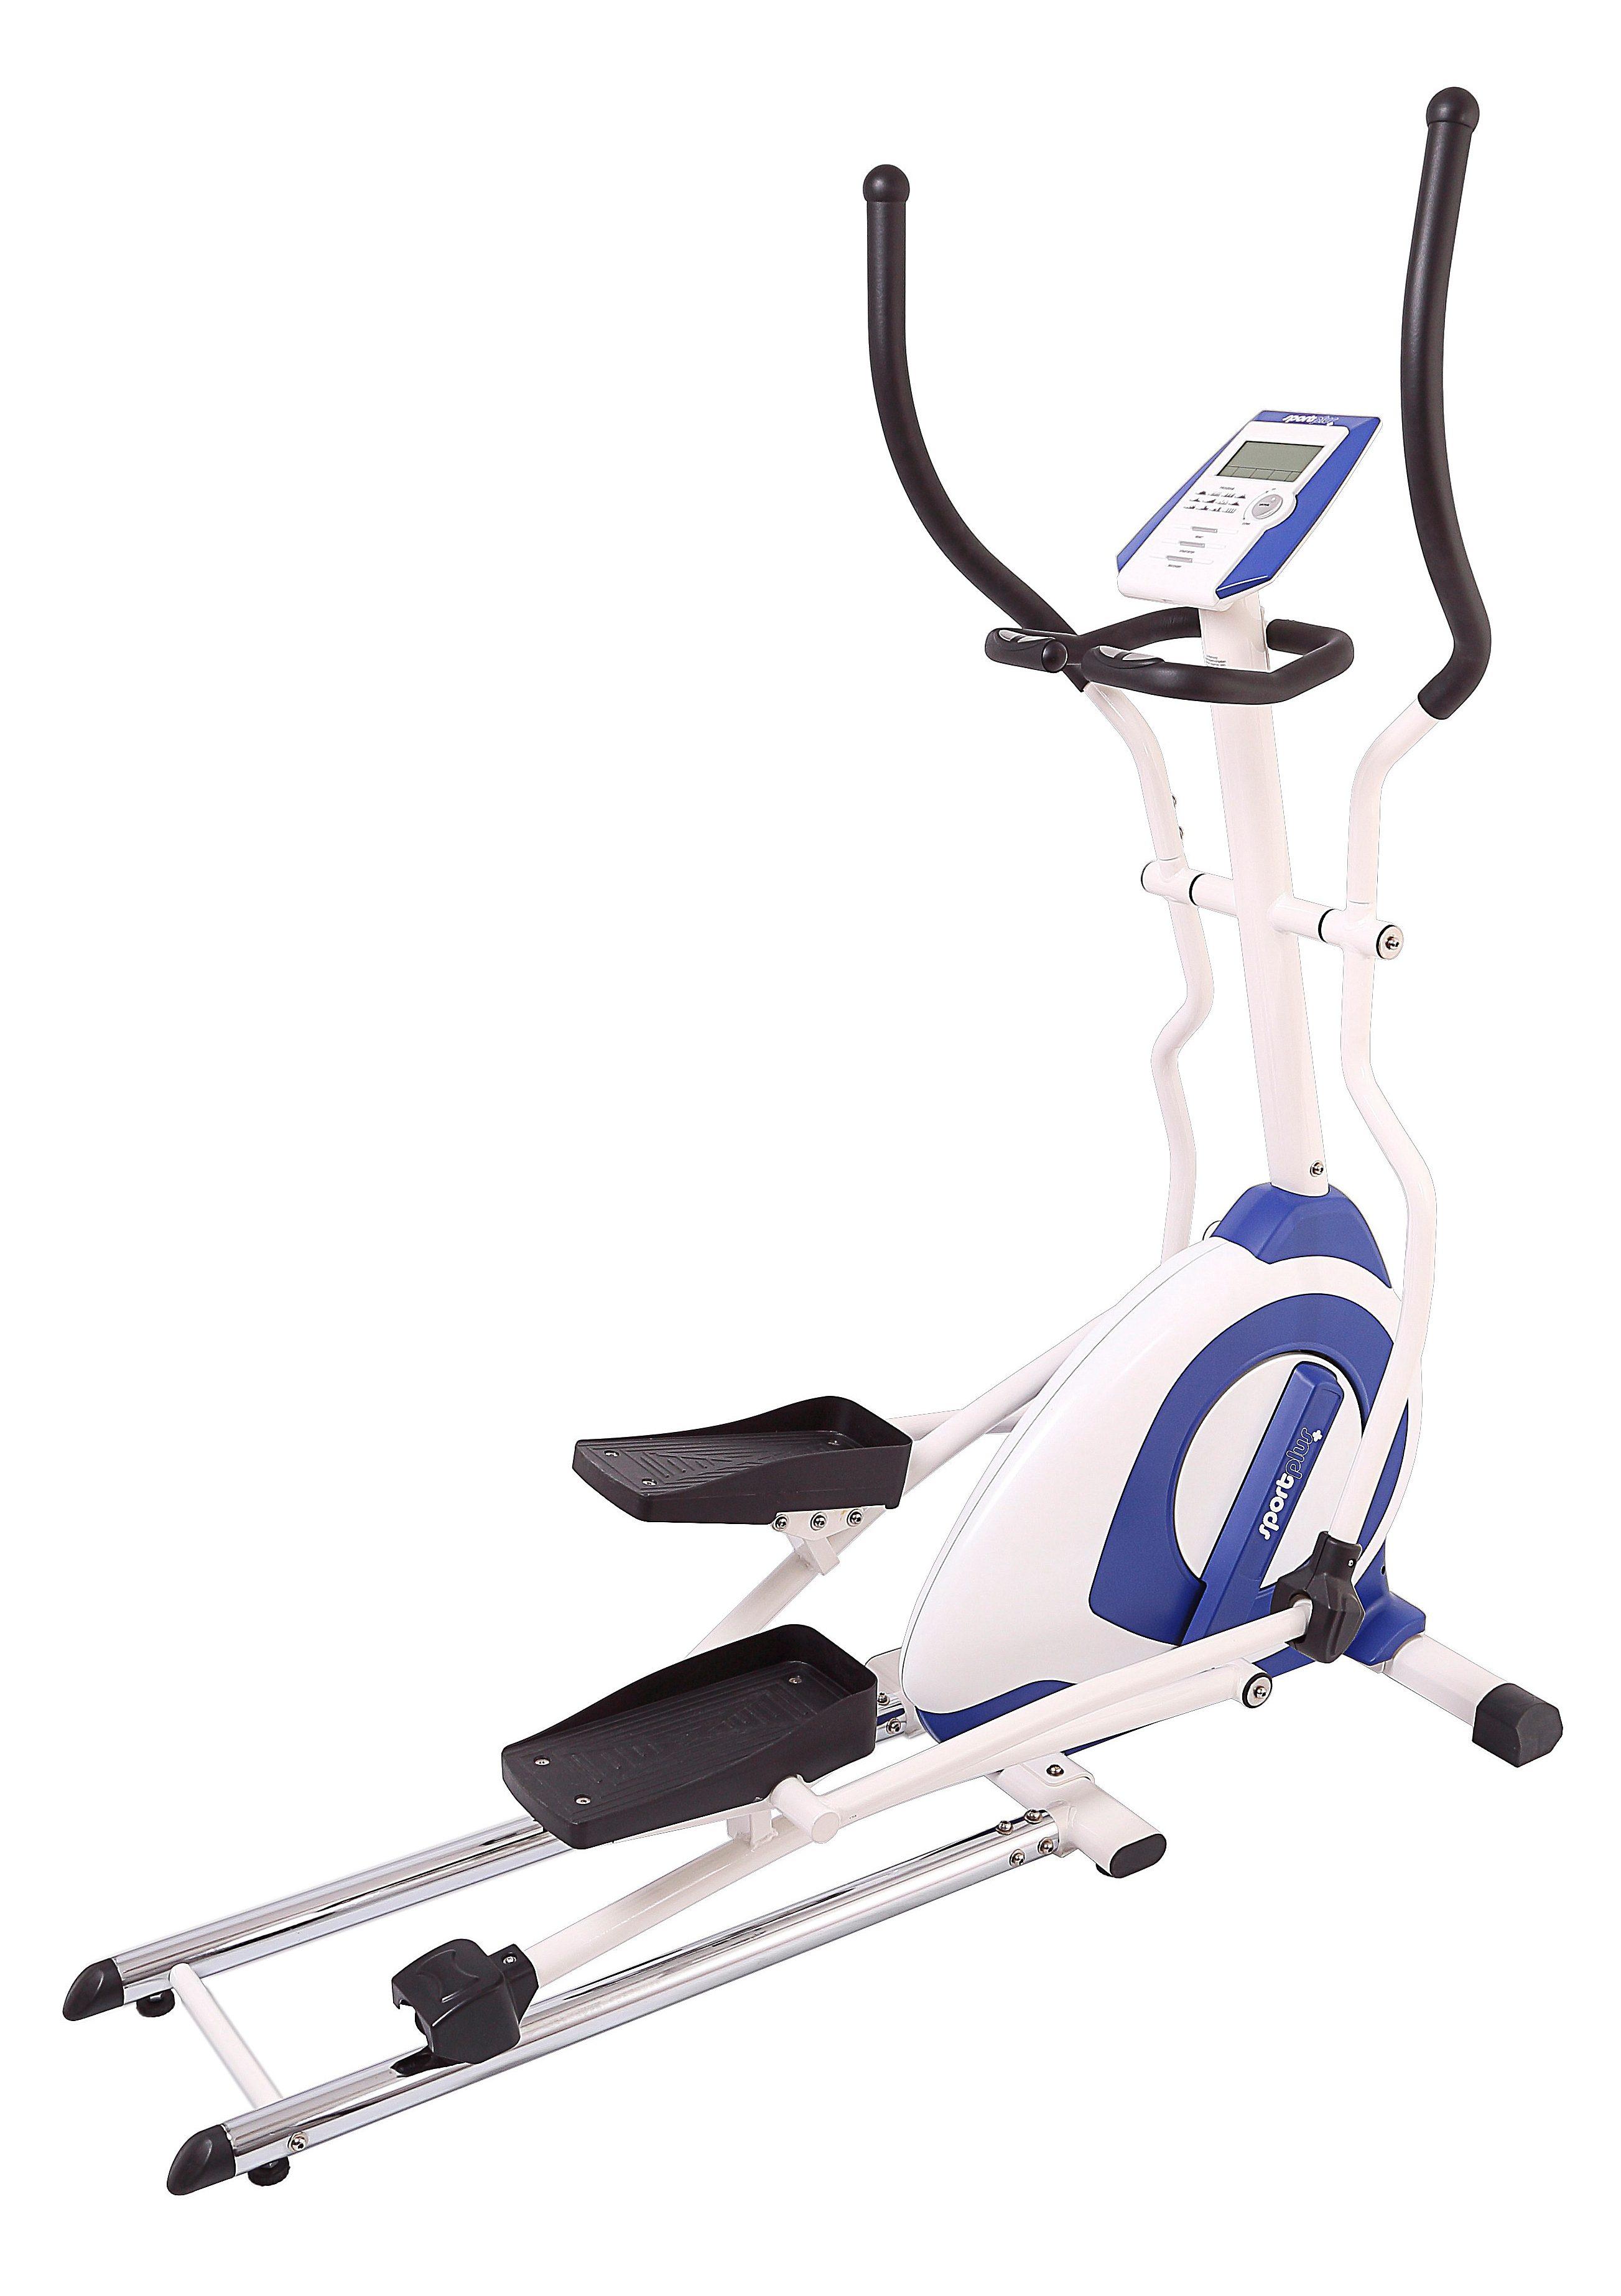 Crosstrainer-Ergometer, »Frontwheeler SP-ET-7000-E«, Sportplus